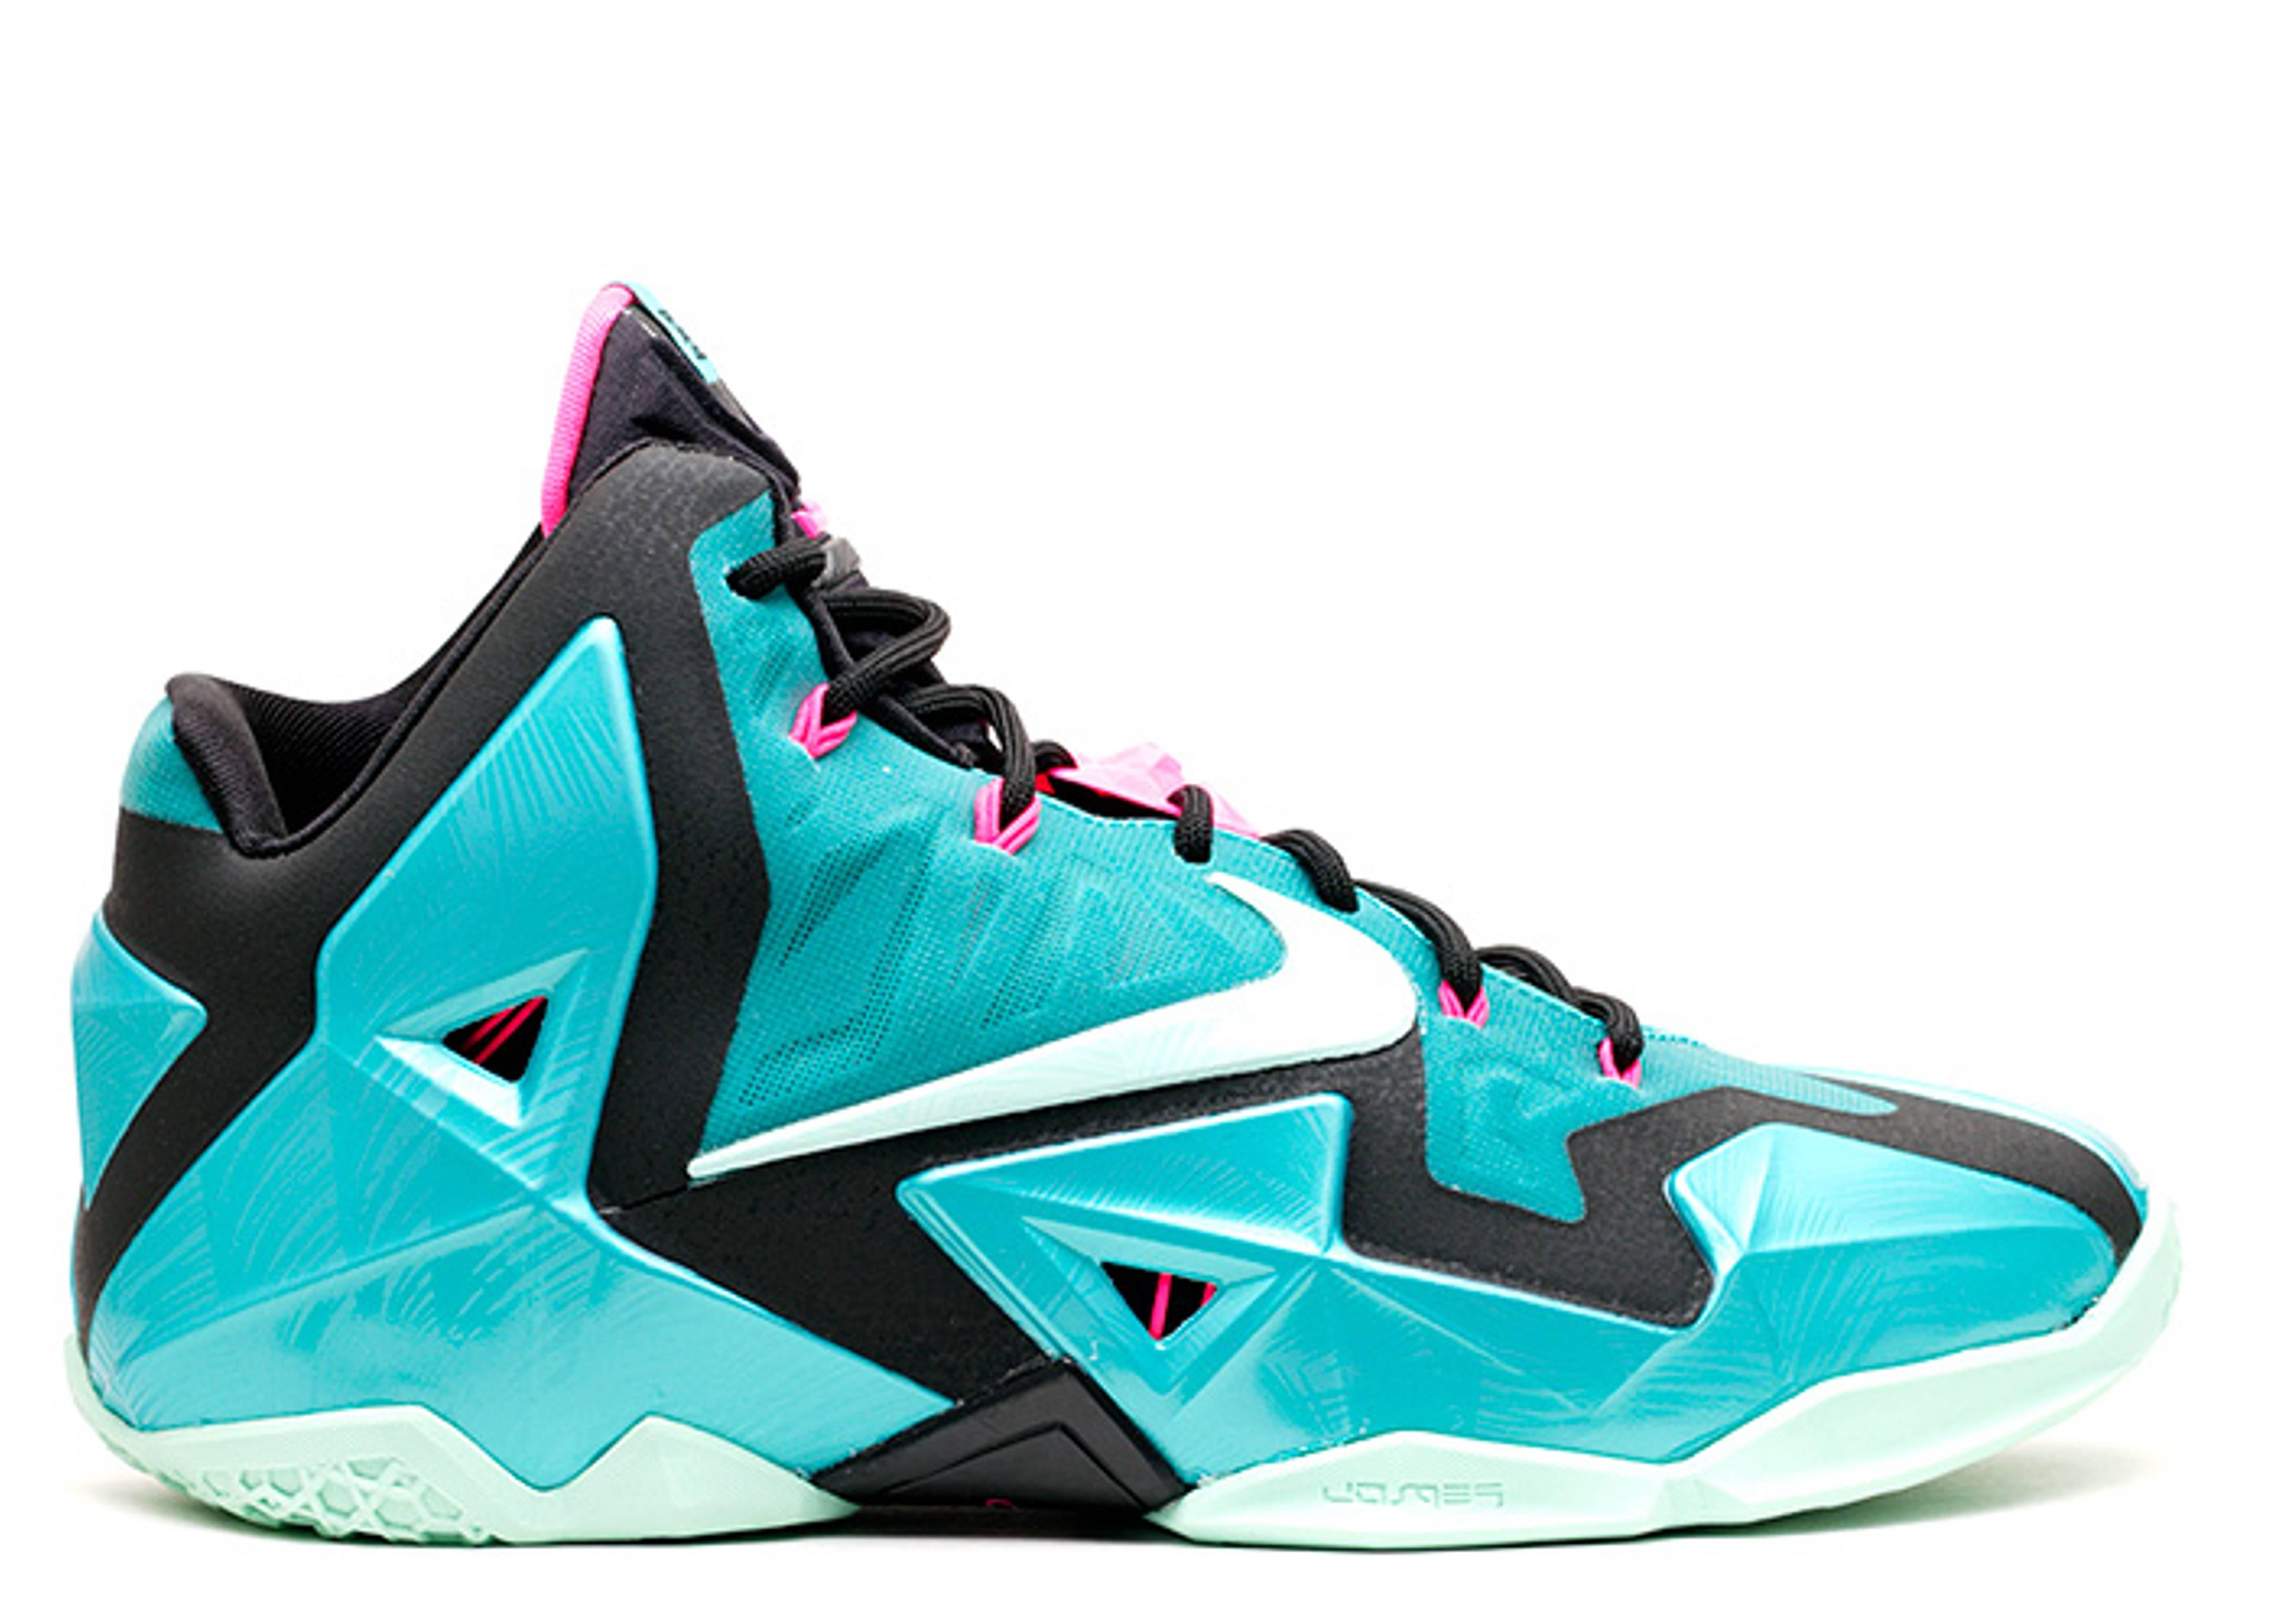 Papà decisamente microscopico  LeBron 11 'South Beach' - Nike - 616175 330 - sport turq/medium mint-black  | Flight Club